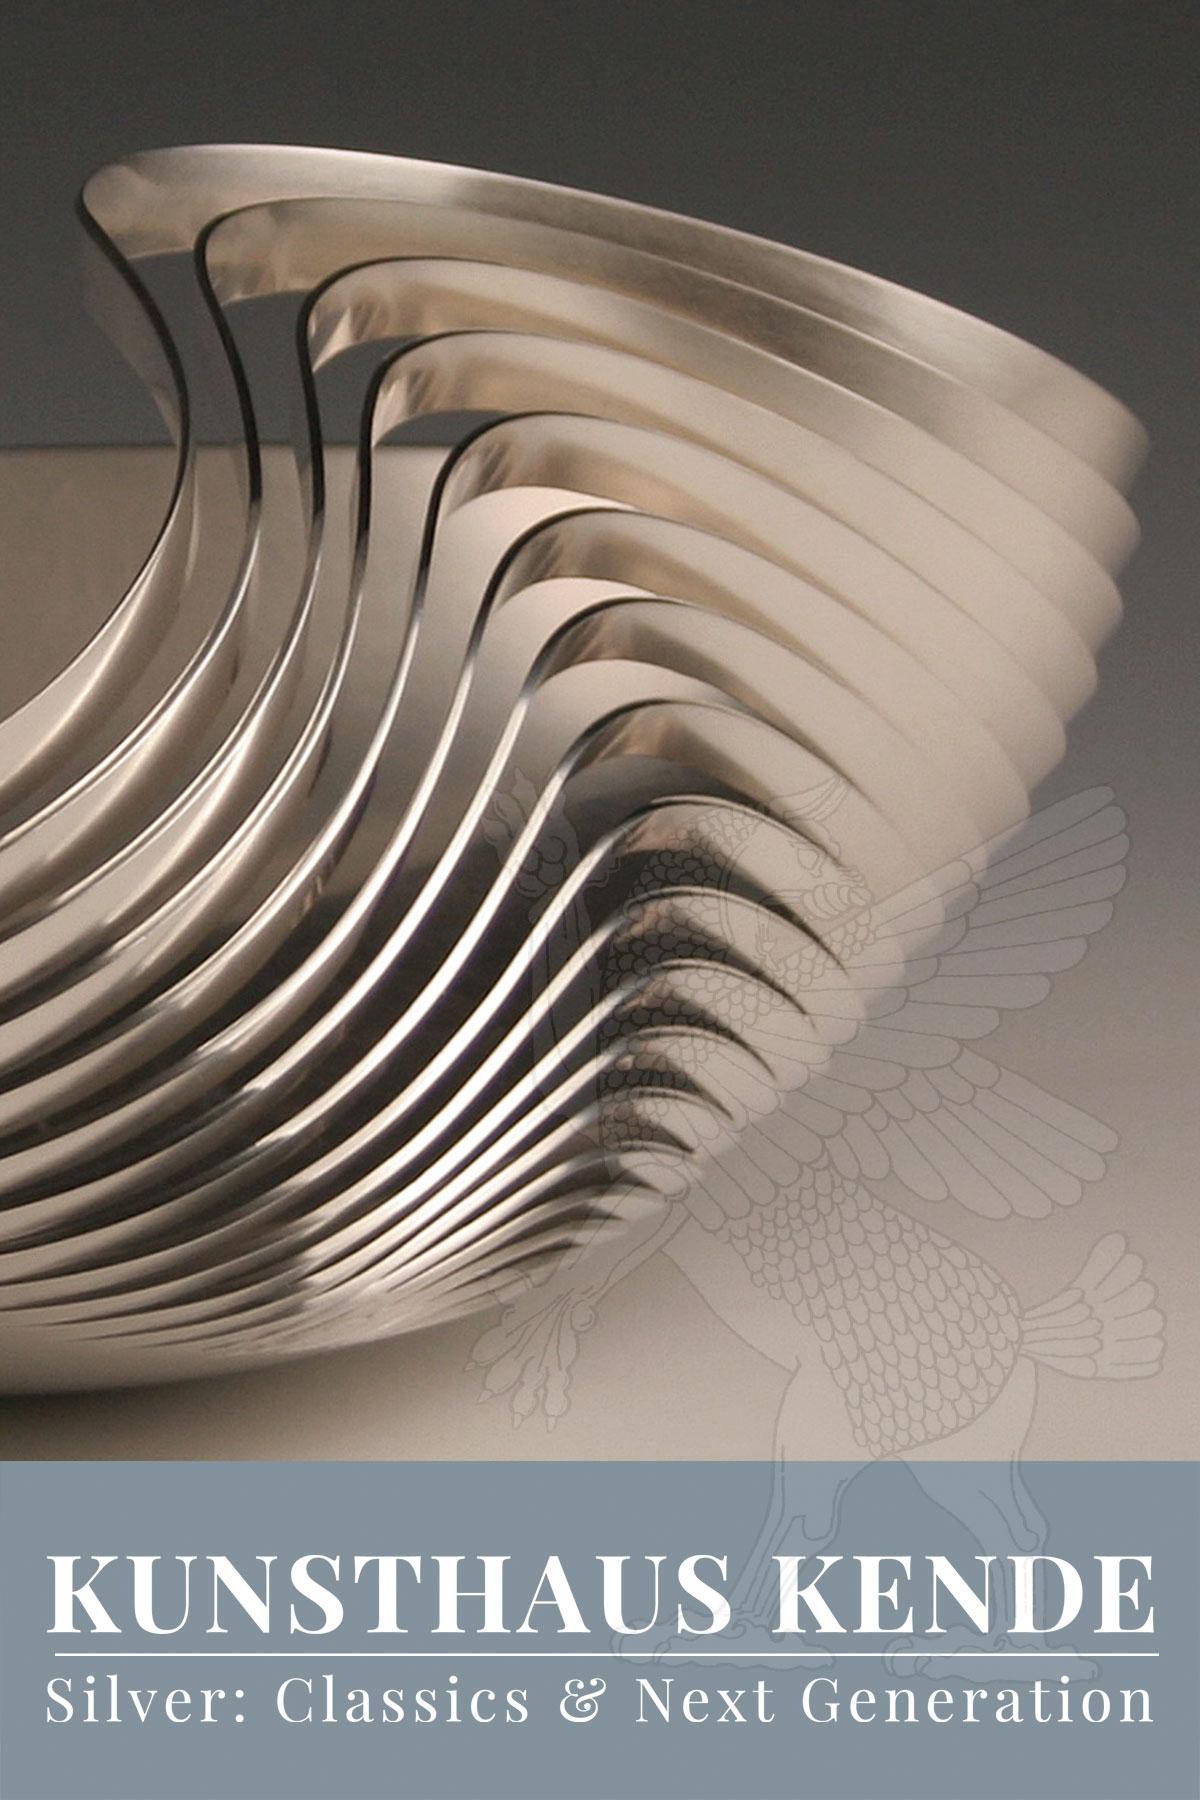 moderne schale sterling silber london dekoschale georg jensen